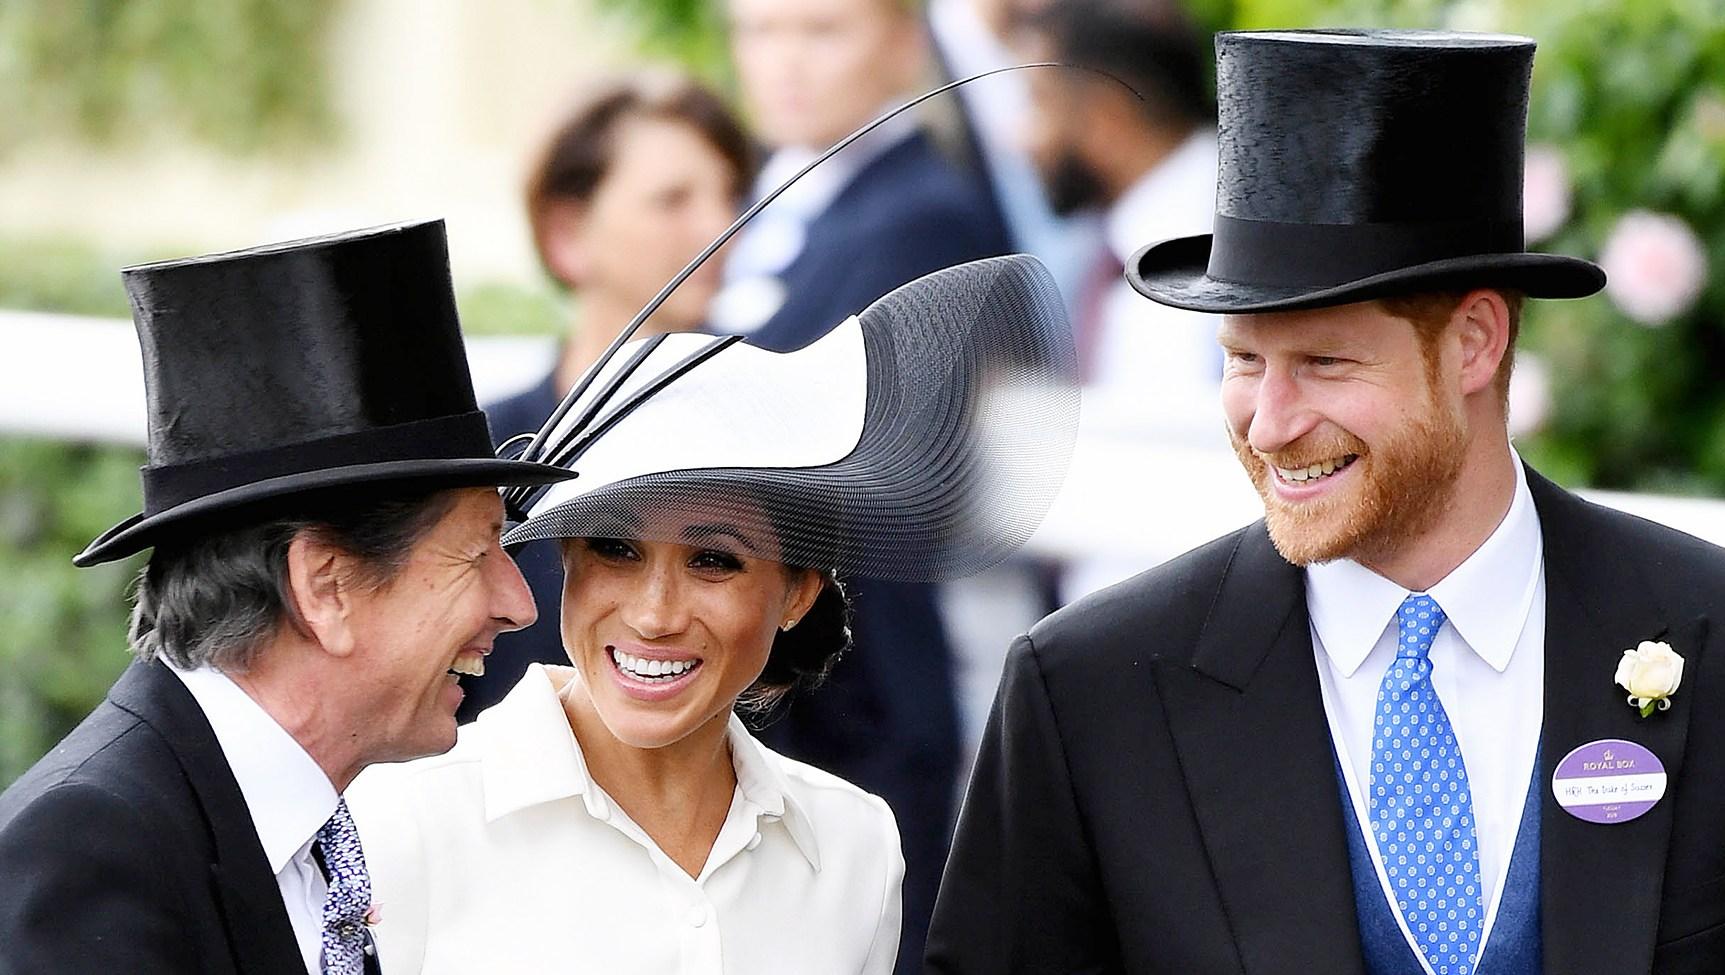 John Warren Duchess Meghan Markle Prince Harry Royal Ascot Day 1